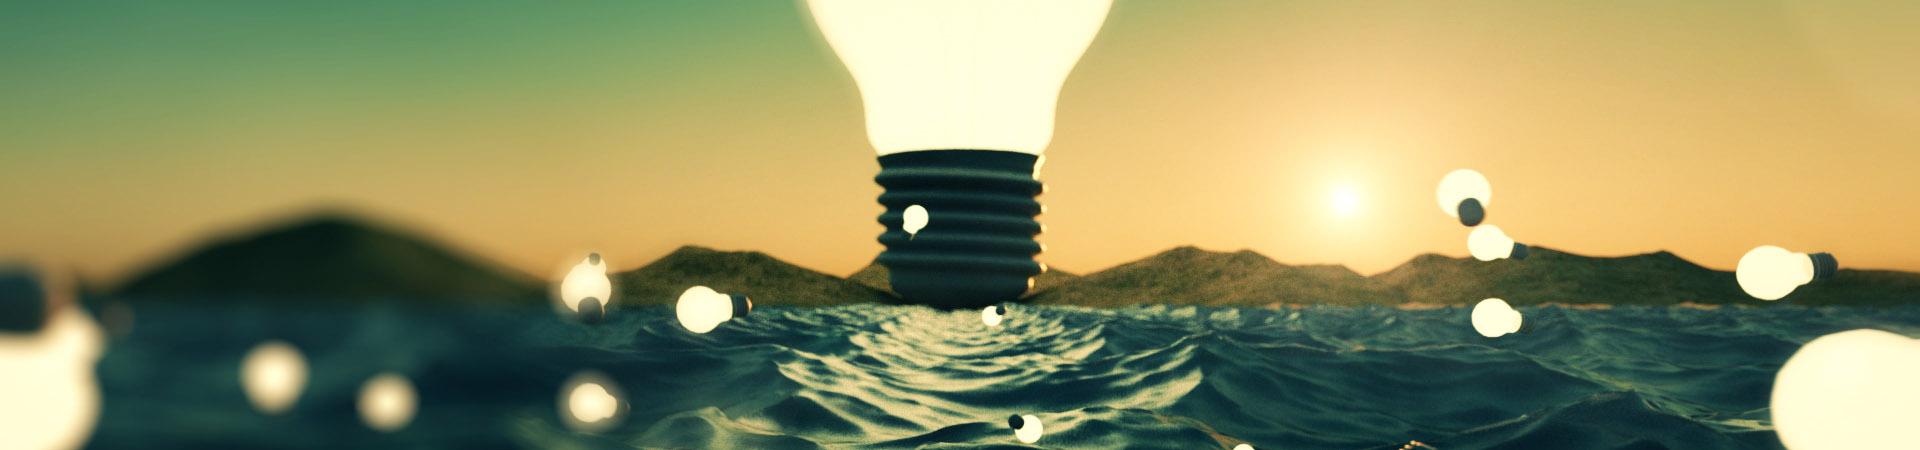 Ghosteam Light Bulbs